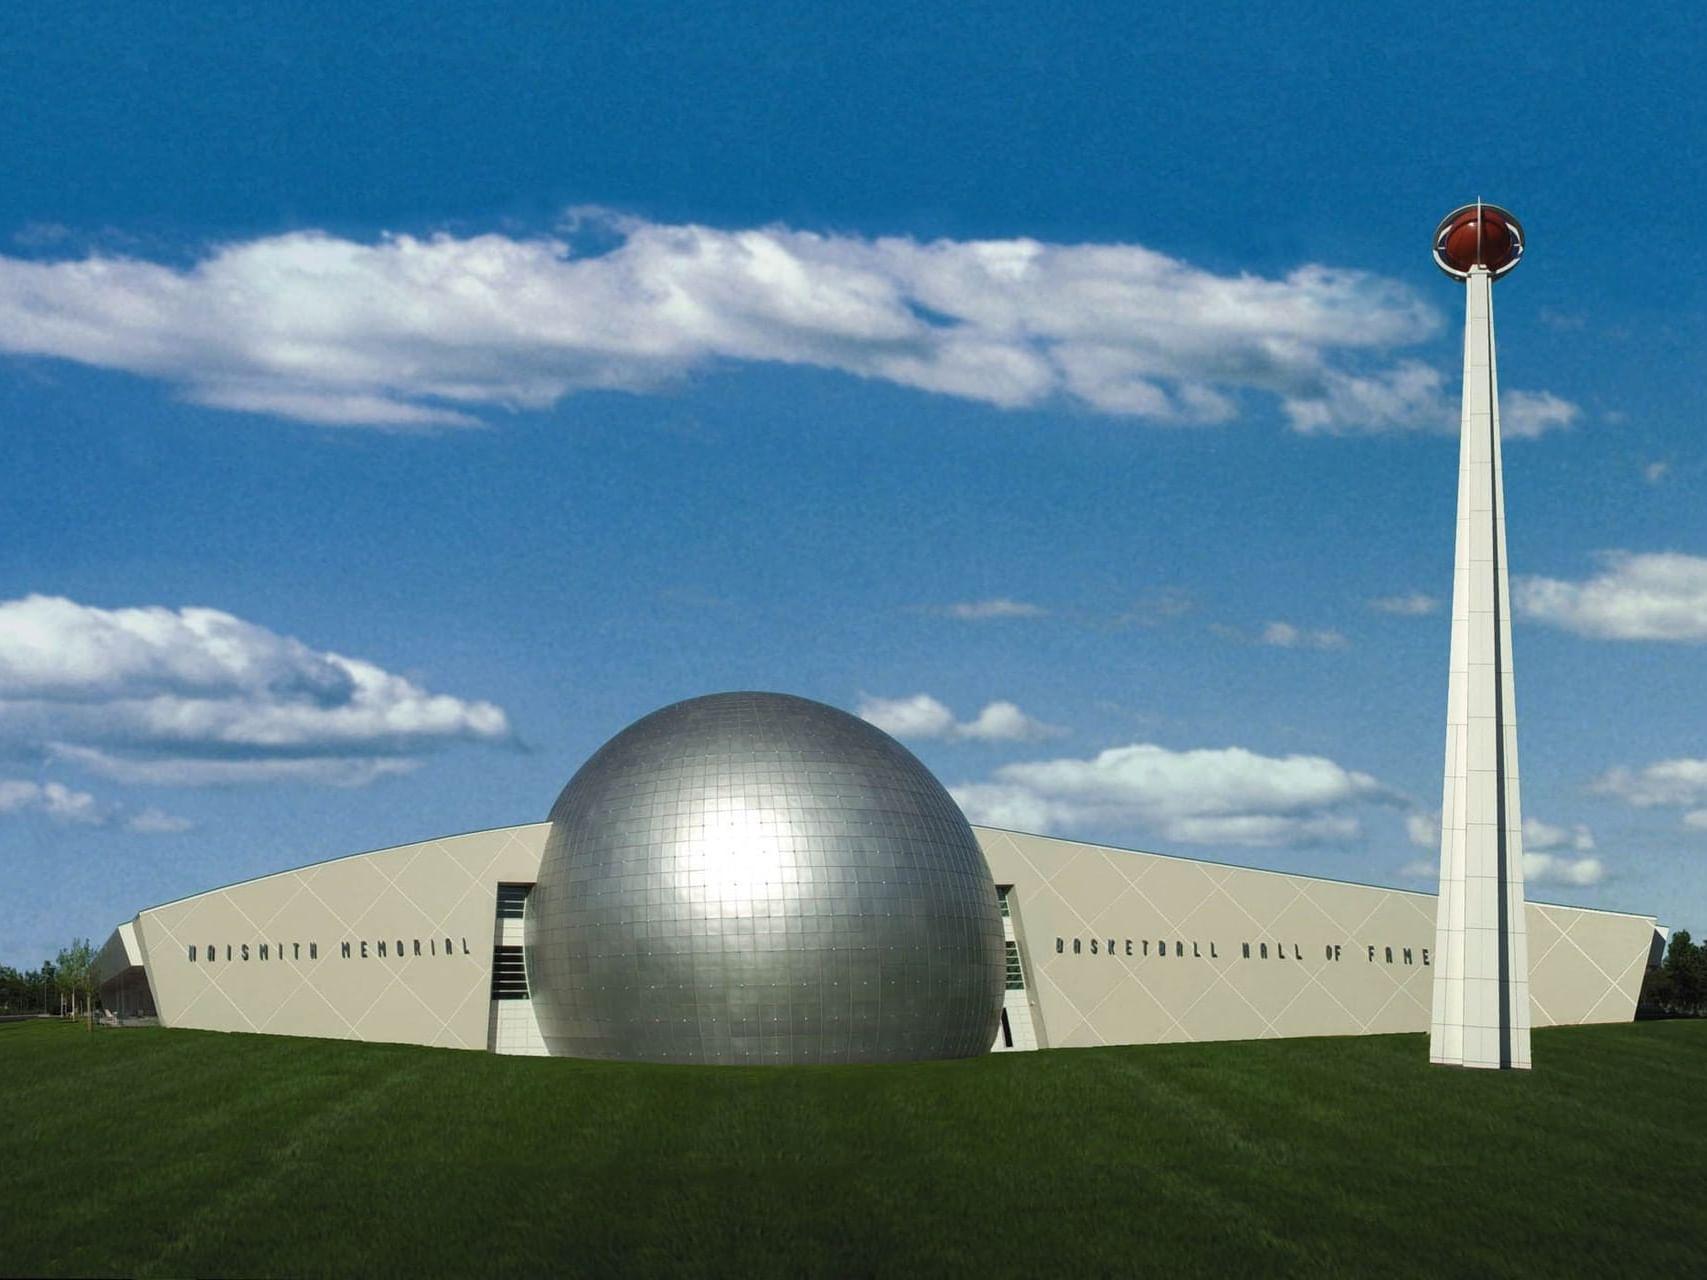 Naismith Memorial Basketball Hall of Fame near Farmington Inn and Suites